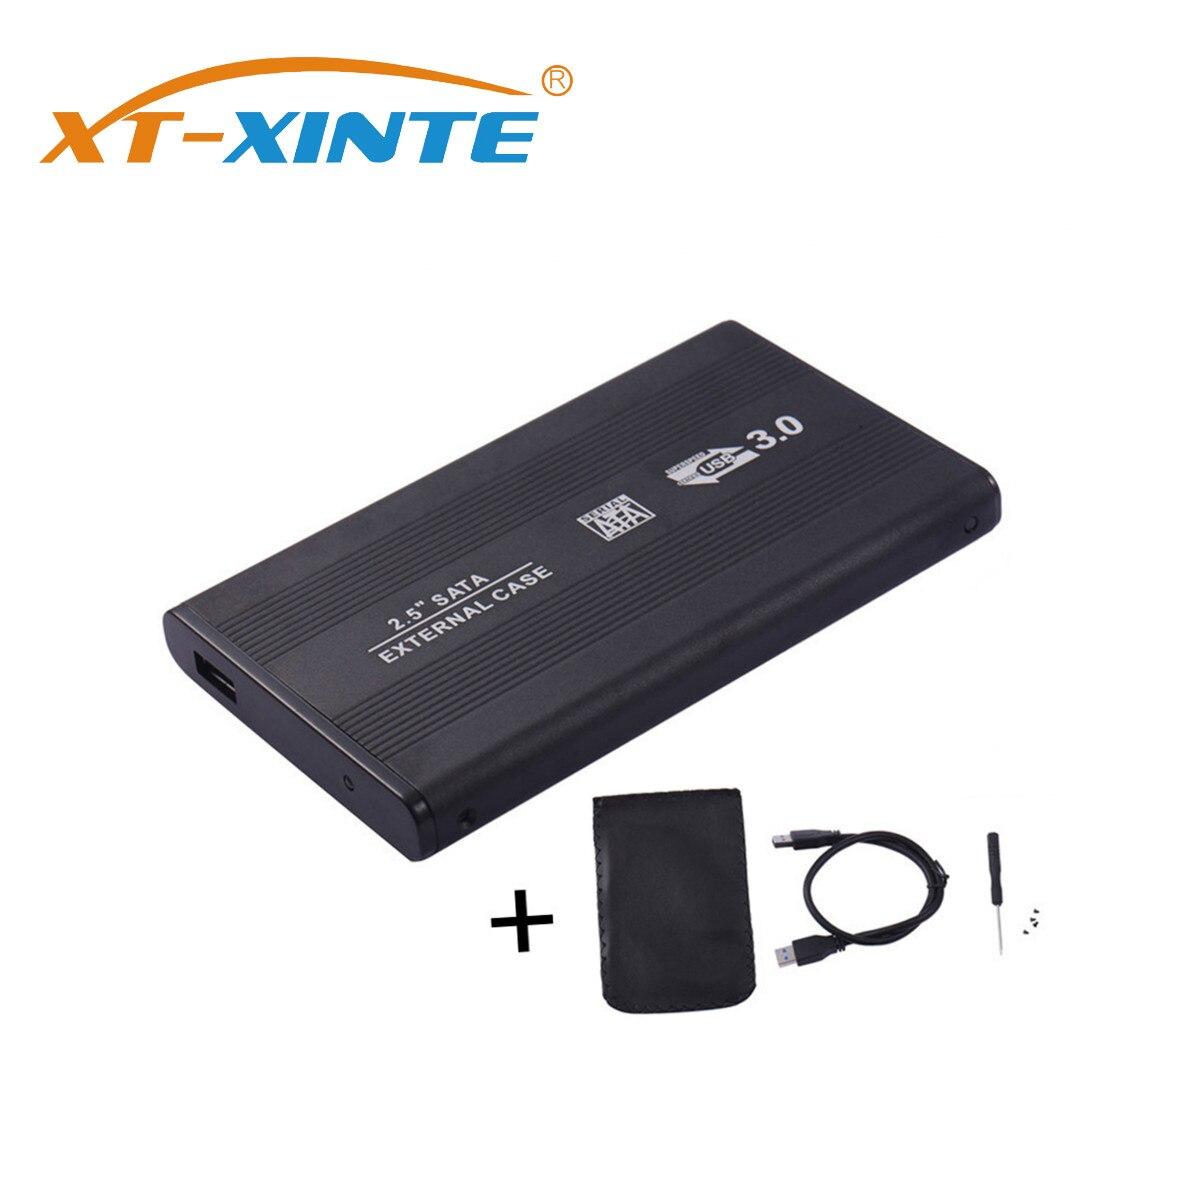 XT-XINTE Sata To USB 3.0 Hard Disk Drive Box High Speed 2.5